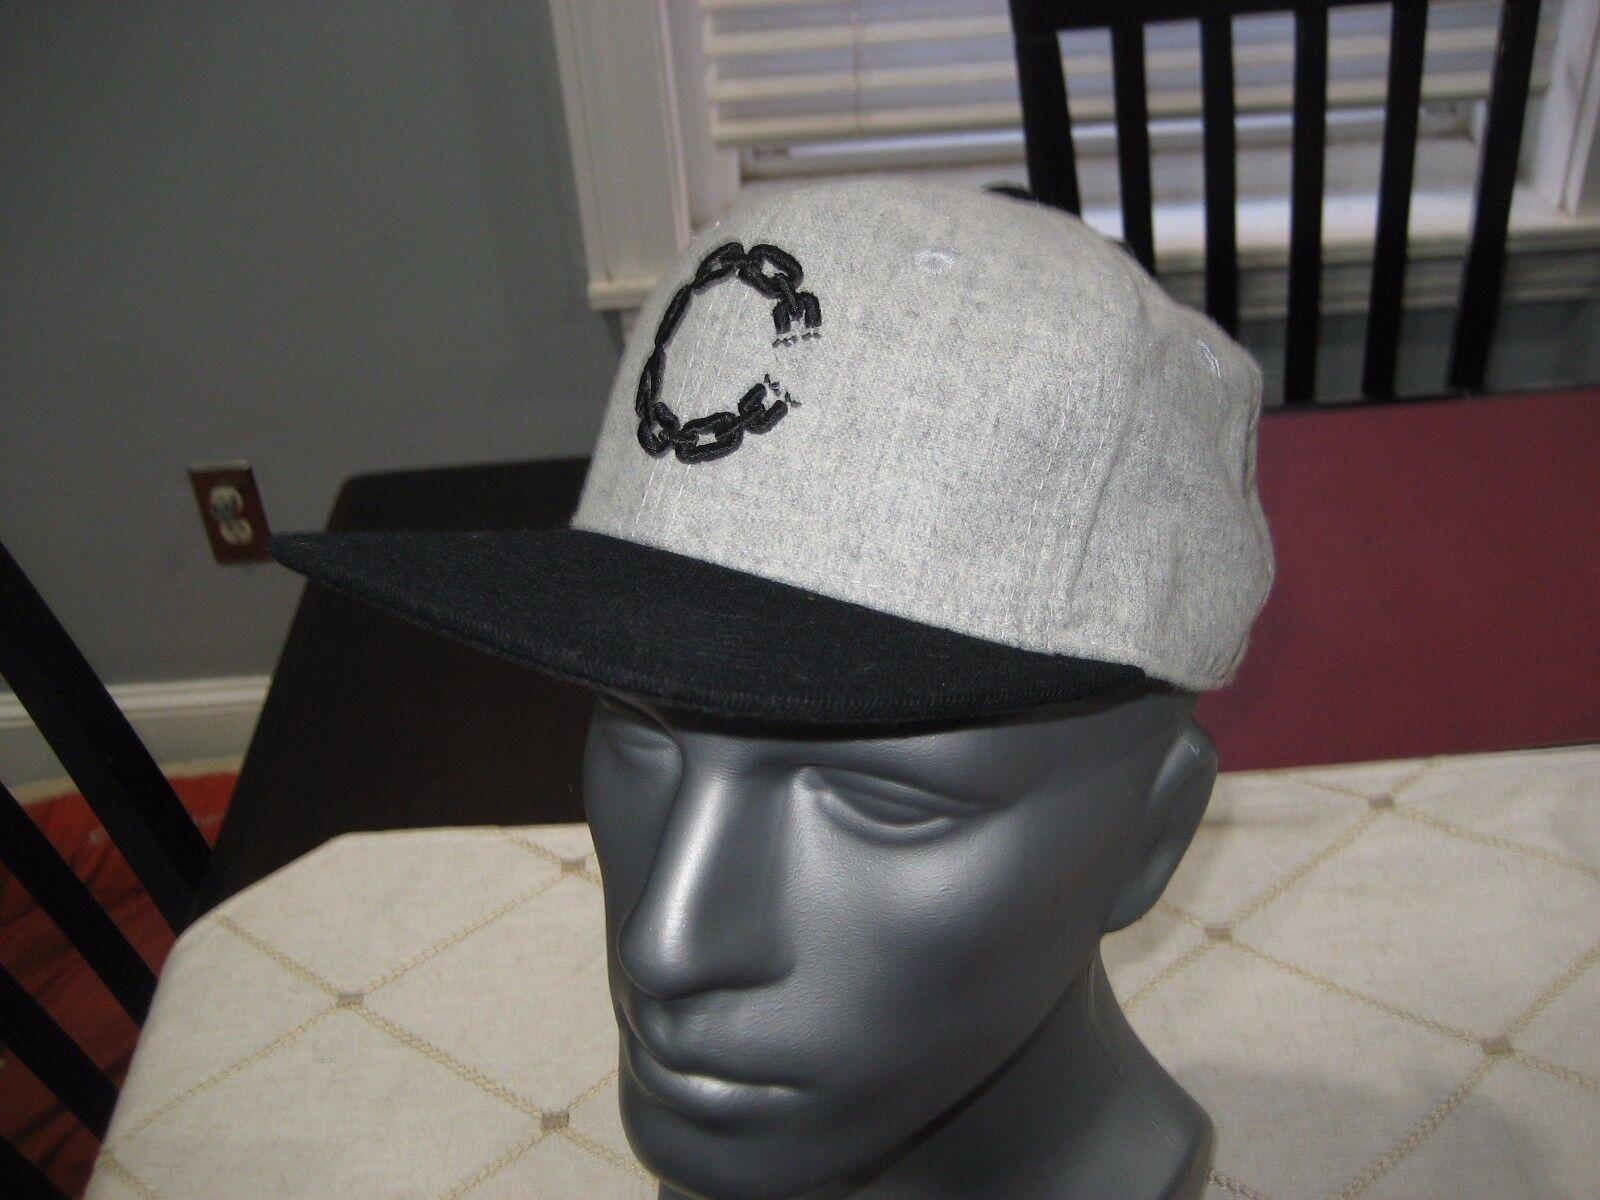 MENS Crooks & Castles SMU Chain CASTLE GRAY/Black SNAPBACK Hat GRAY/Black CASTLE NWT a9a135